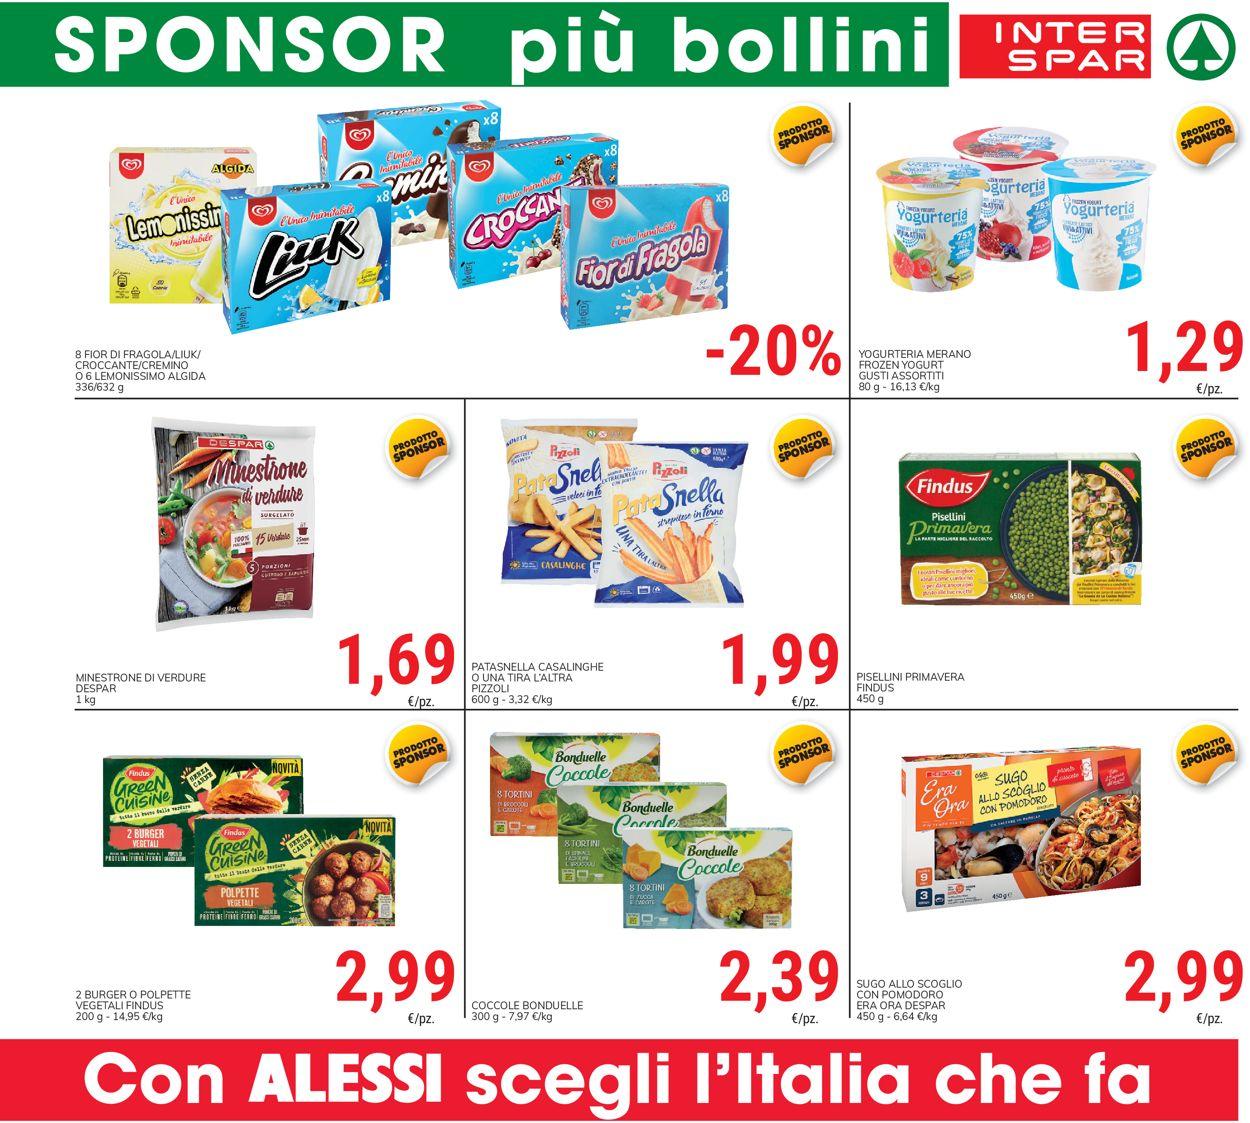 Volantino Interspar - Offerte 27/05-13/06/2021 (Pagina 5)